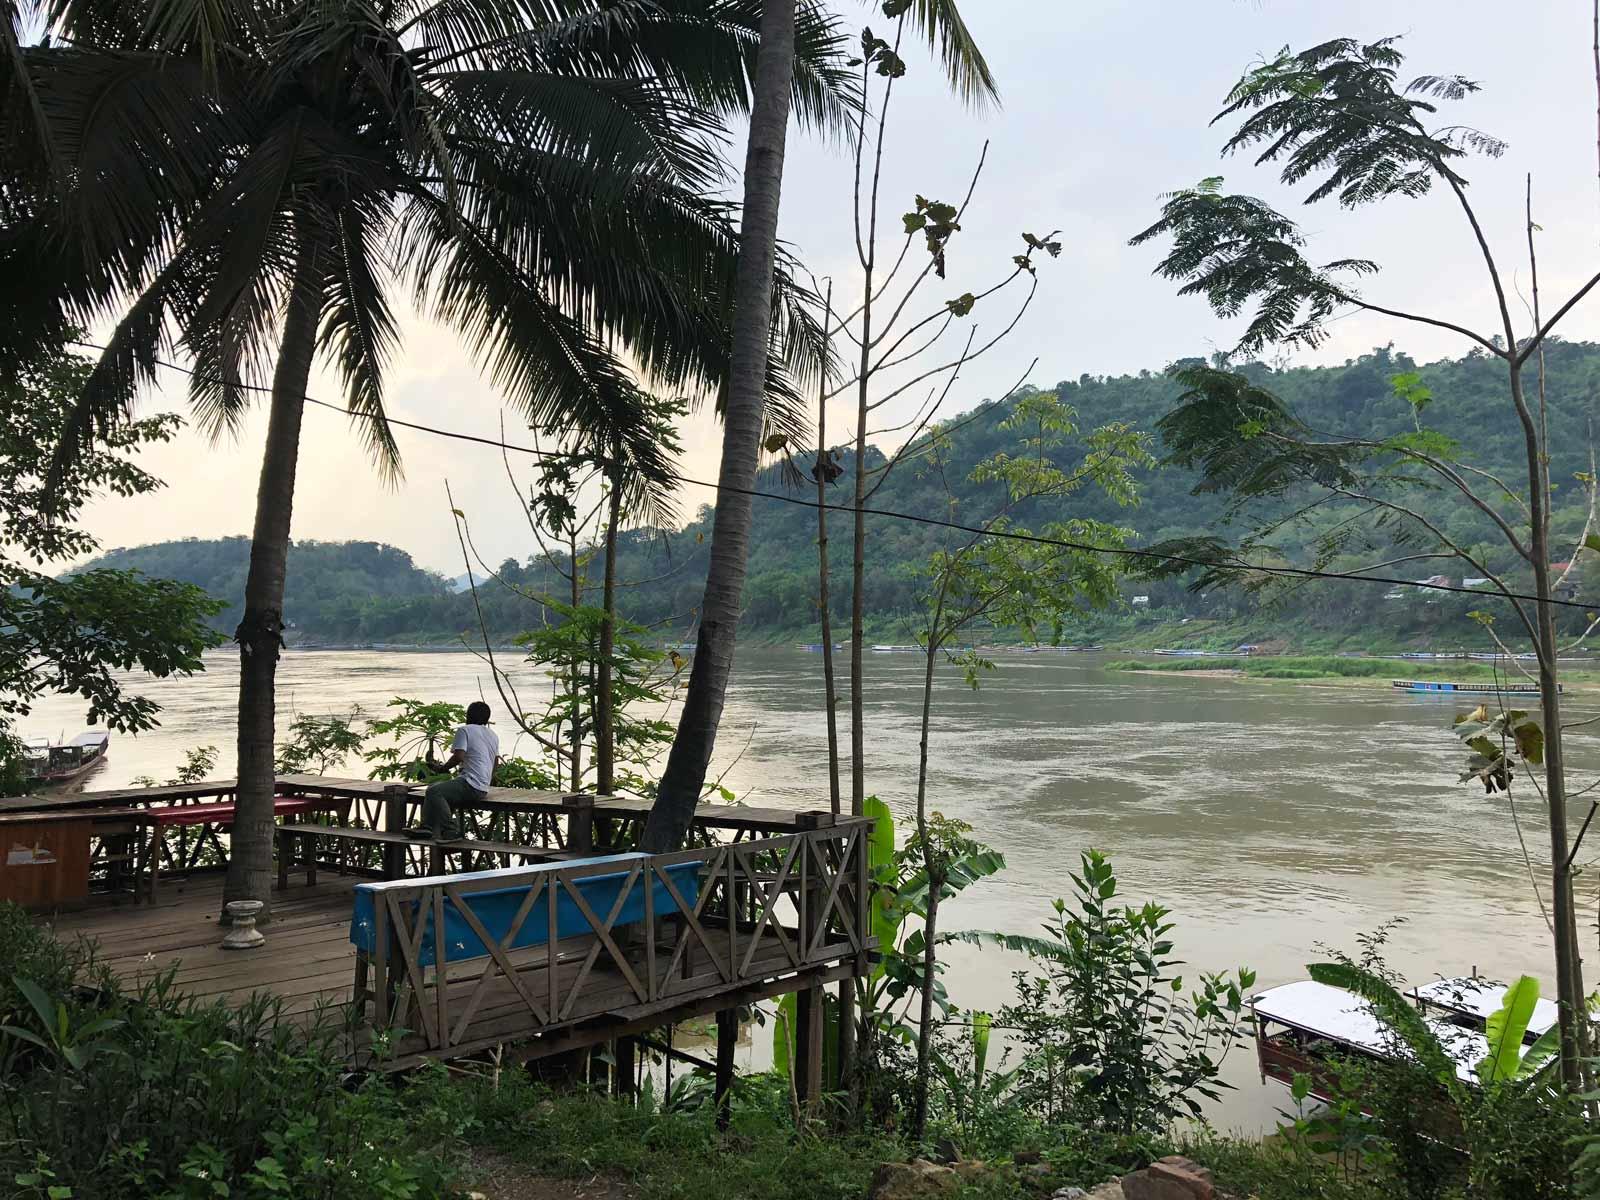 rondreis laos boottocht mekong rivier hoogtepunt 9